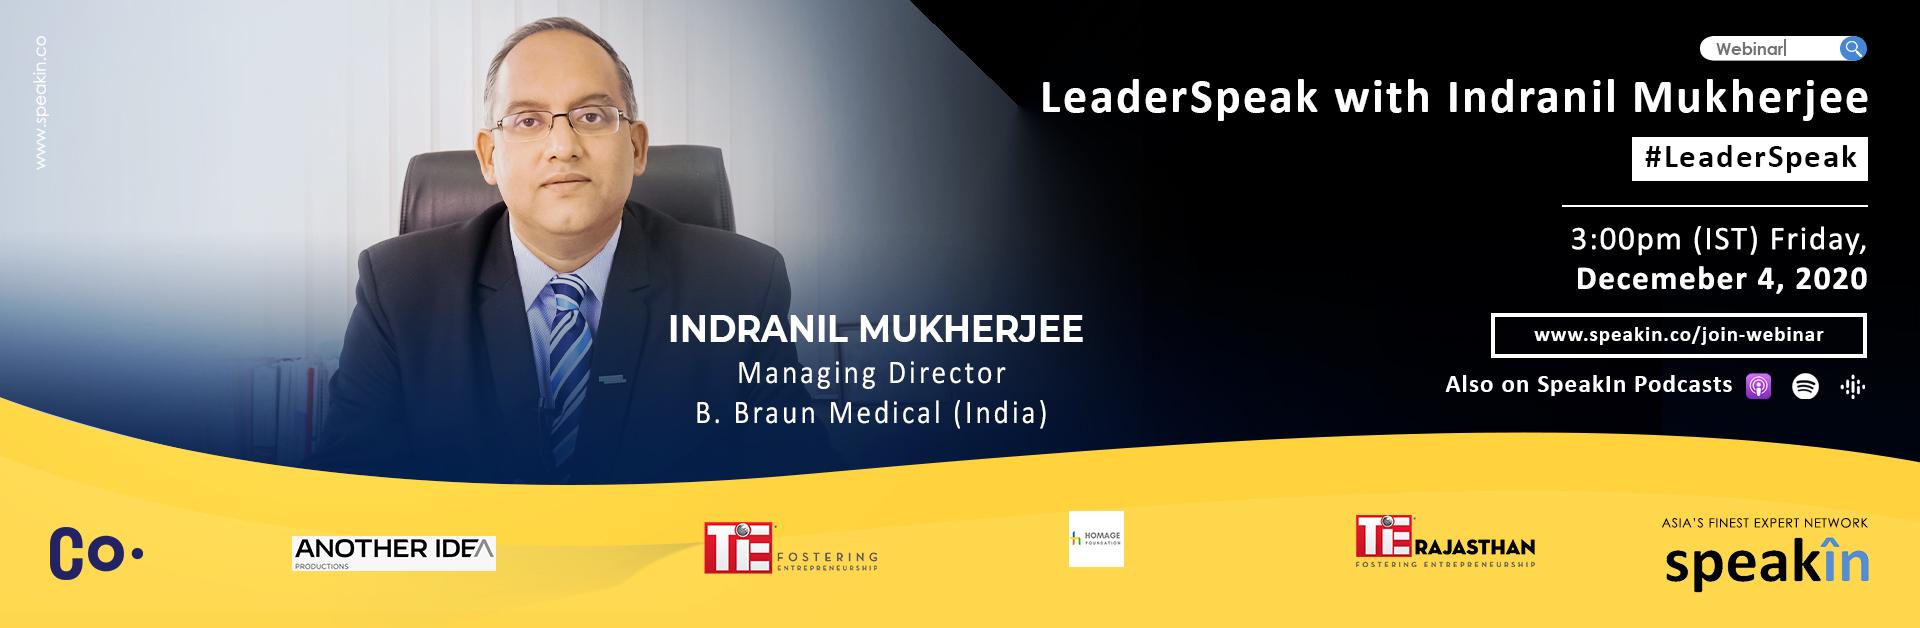 LeaderSpeak with Indranil Mukherjee